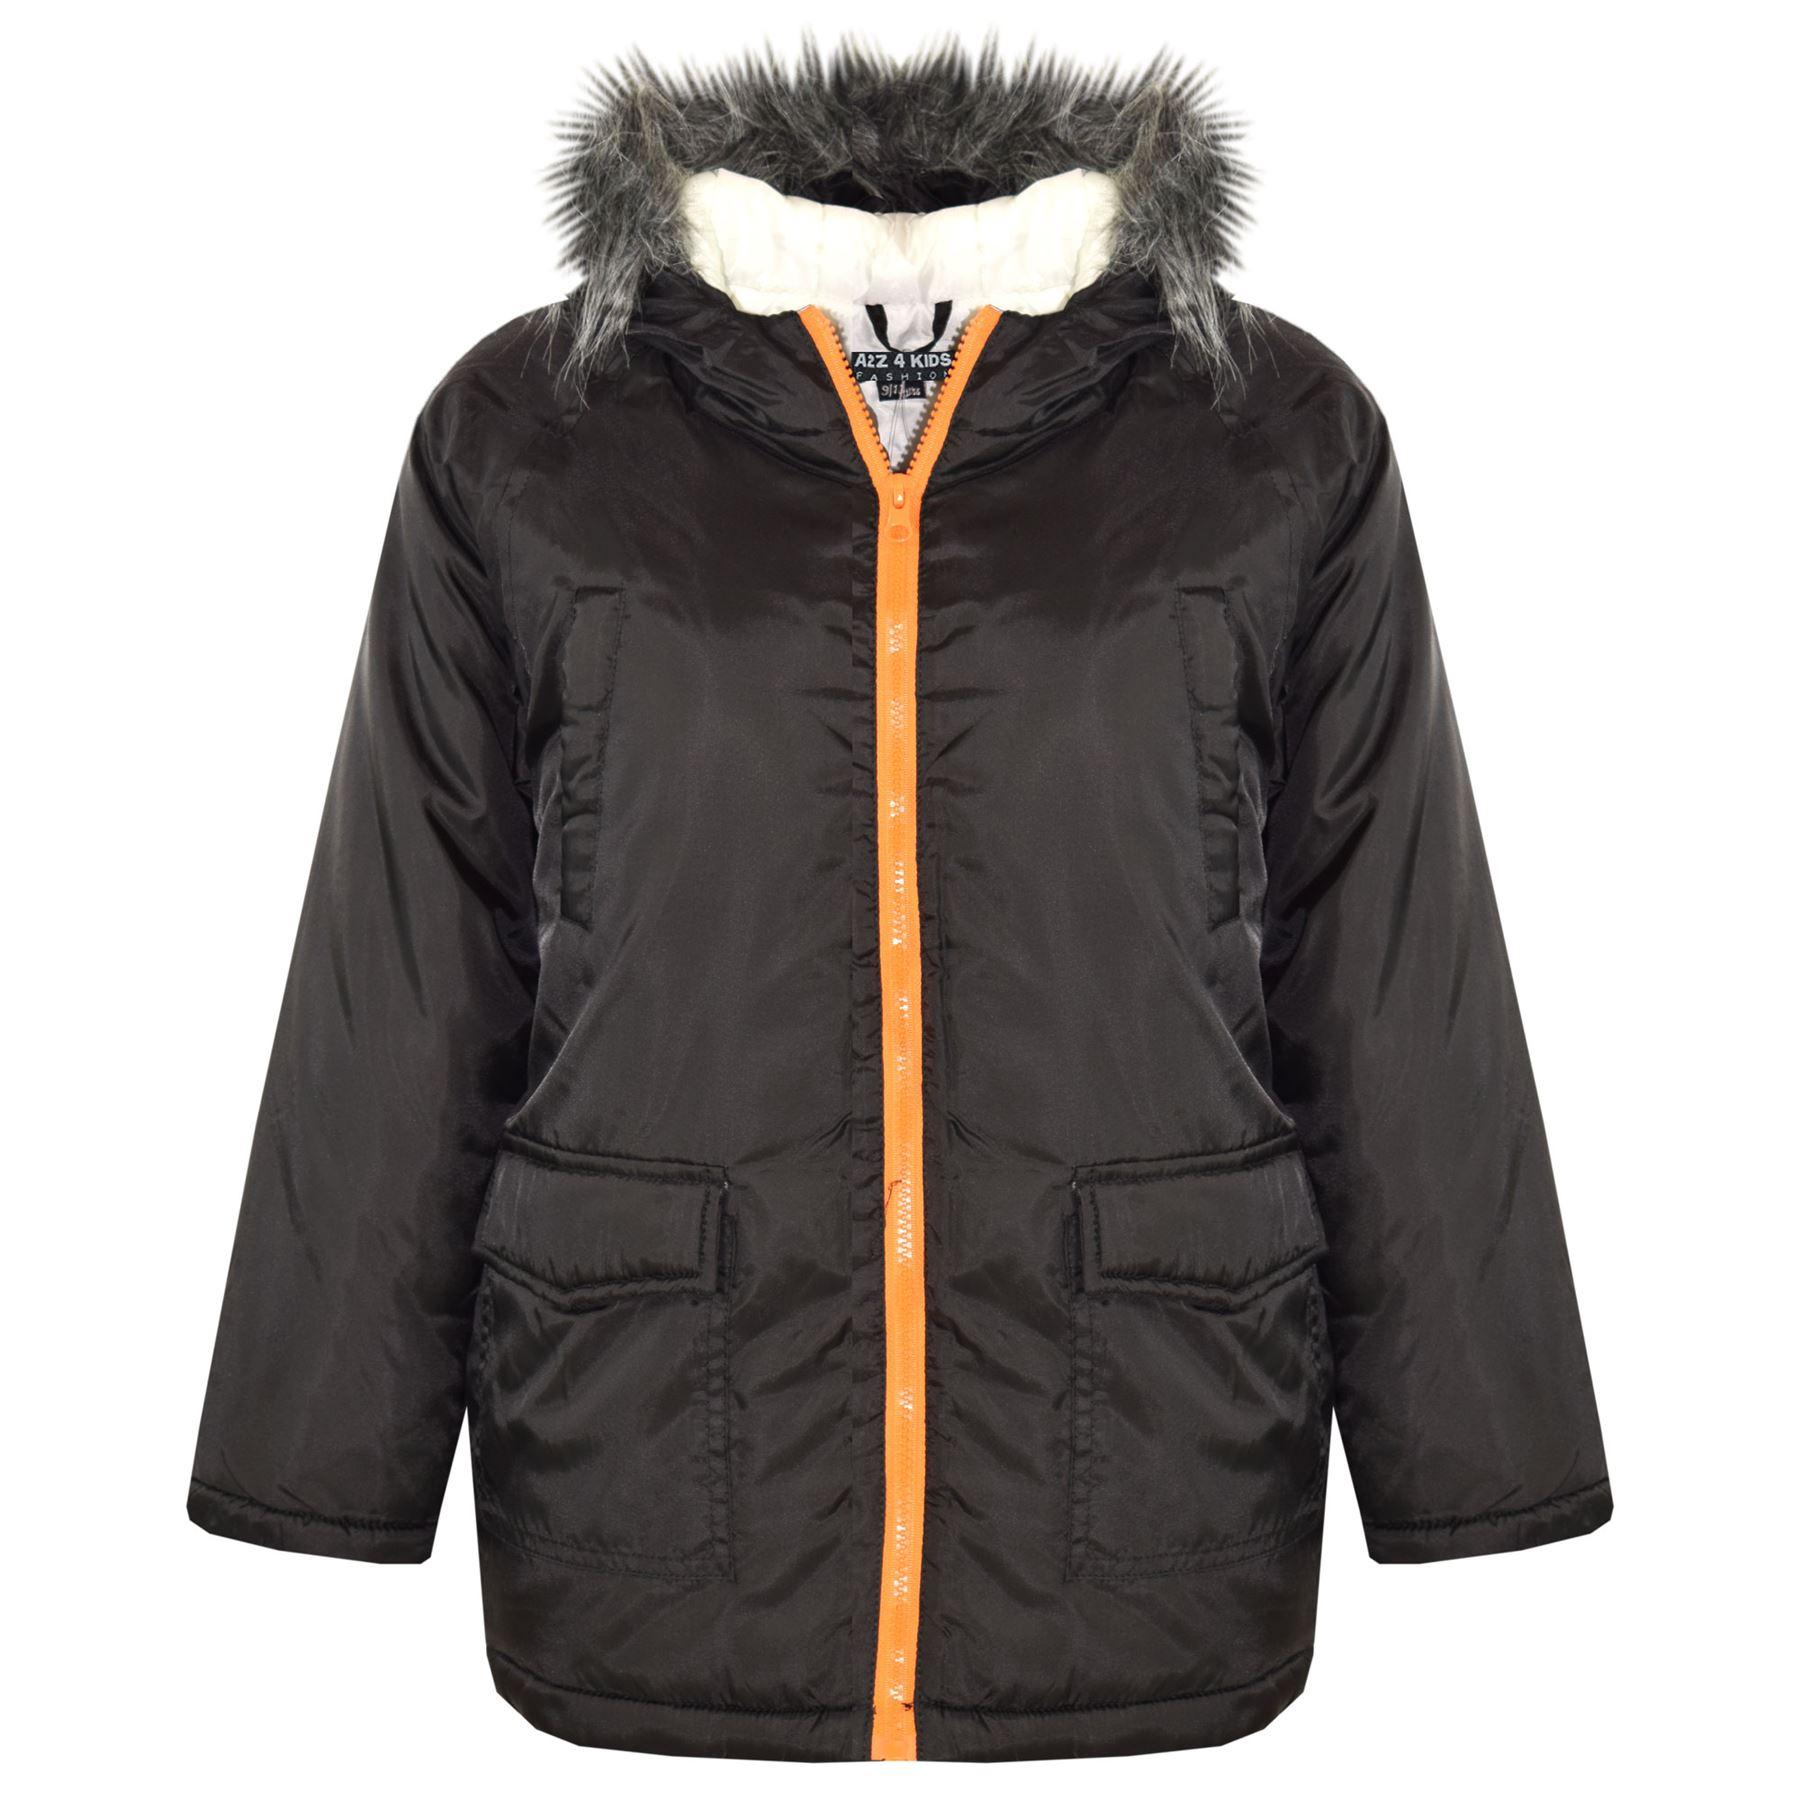 Boys Designer Coat | Boys Jackets Kids Designer Padded Faux Fur Hooded School Warm Thick